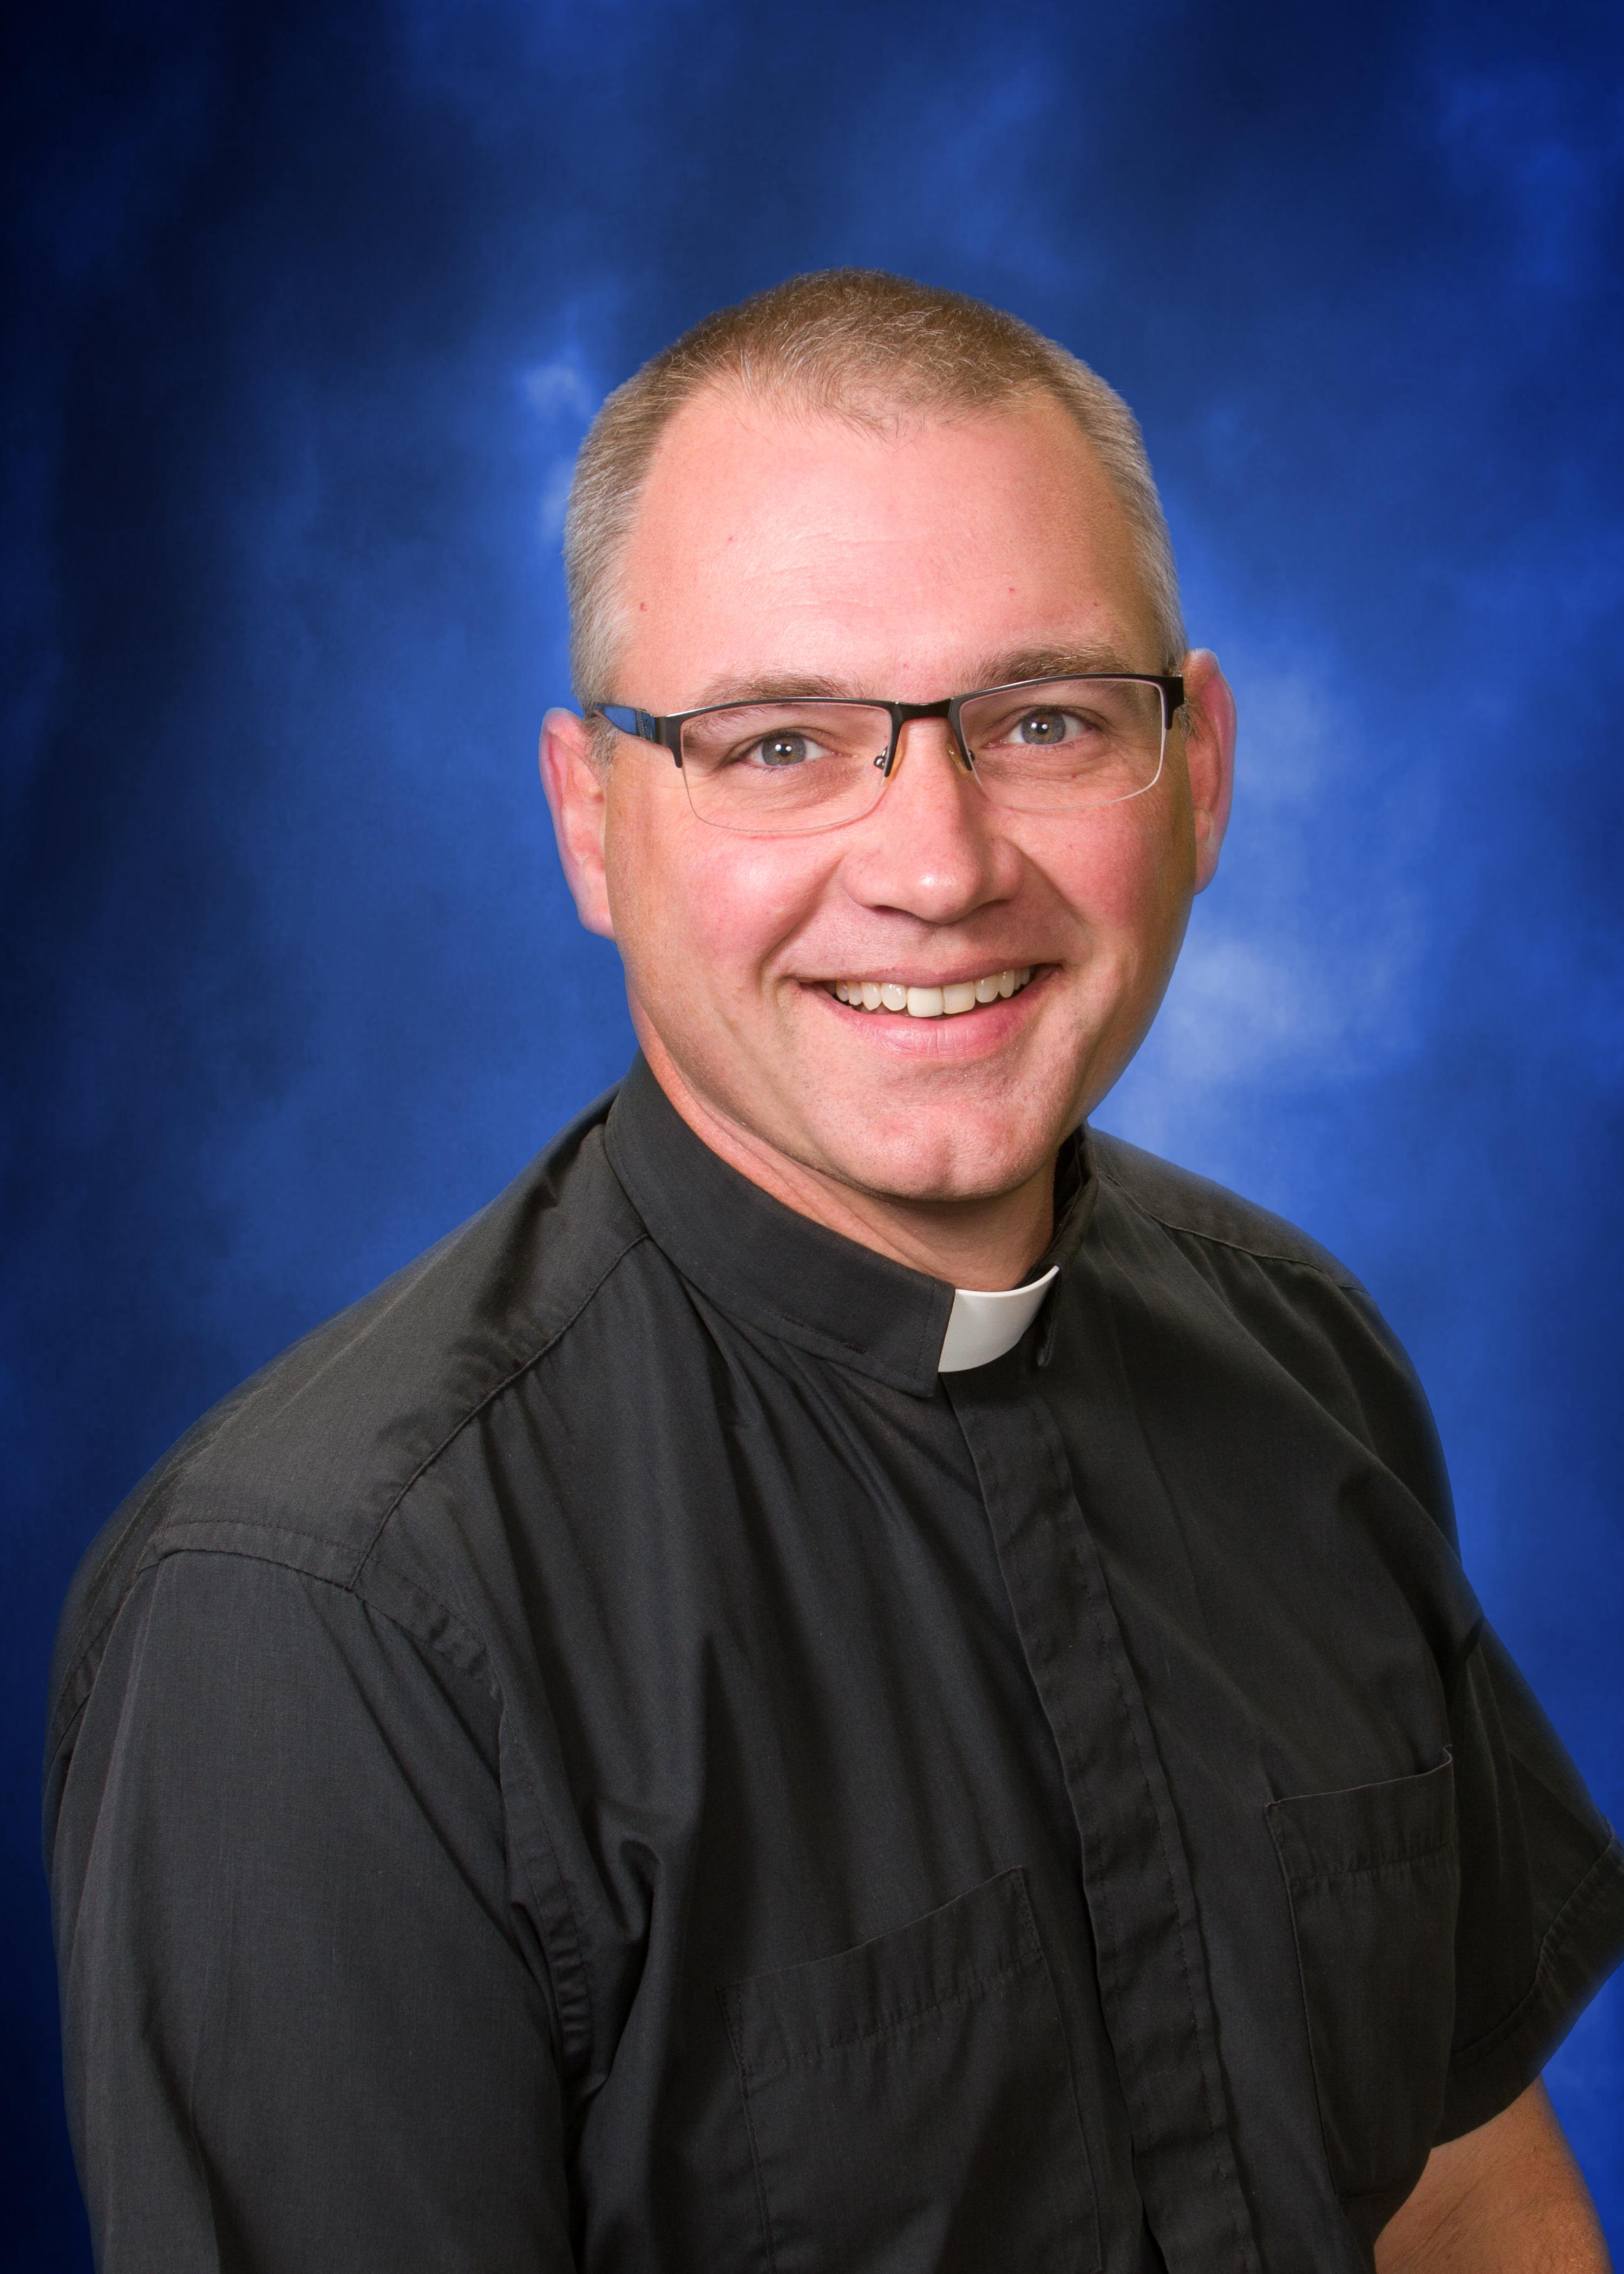 Pastor Duane Bamsch